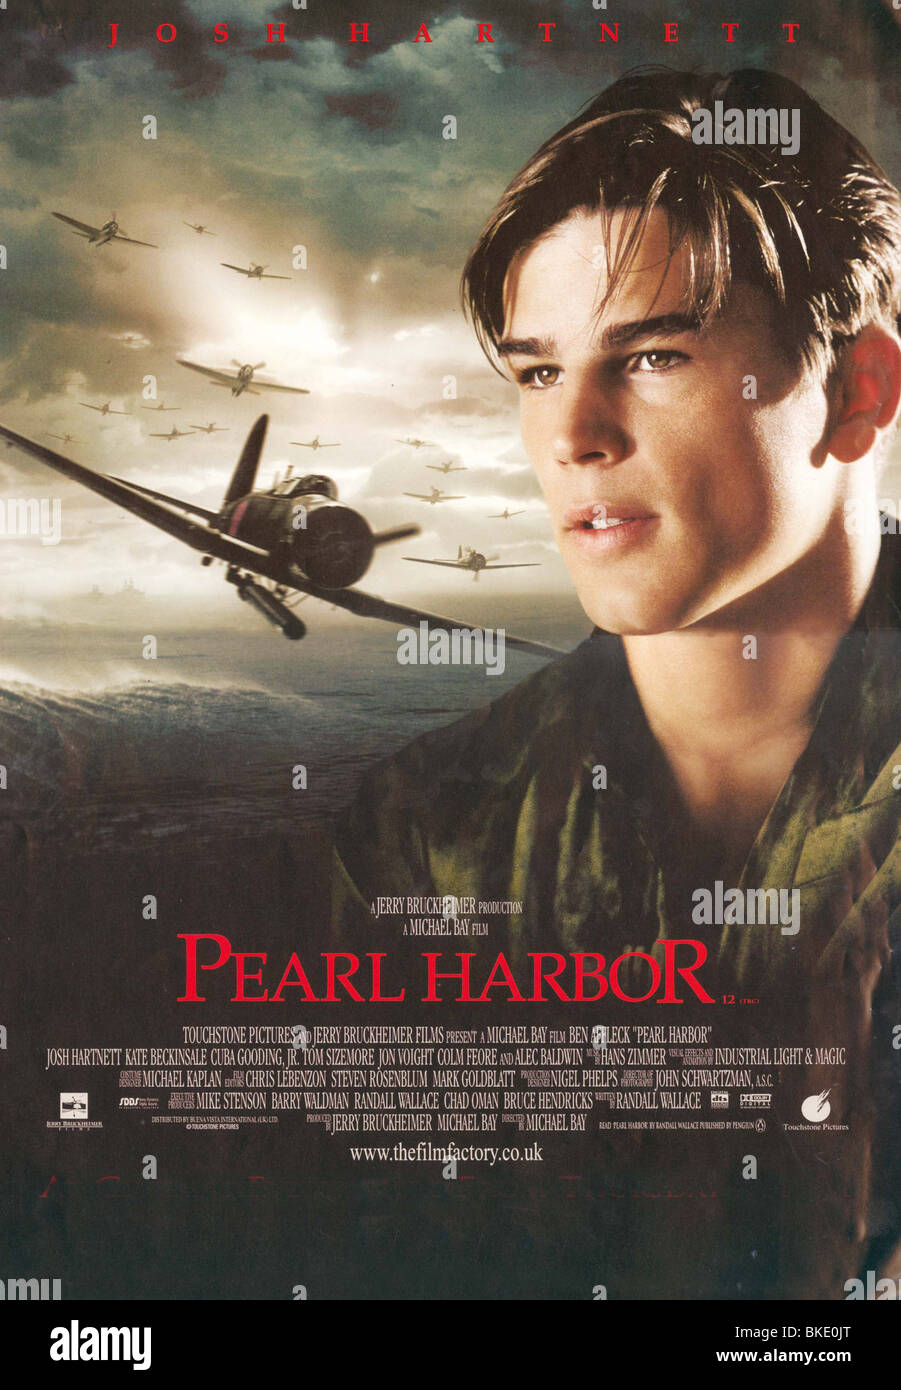 Pearl Harbor 2001 Poster Stock Photo Alamy